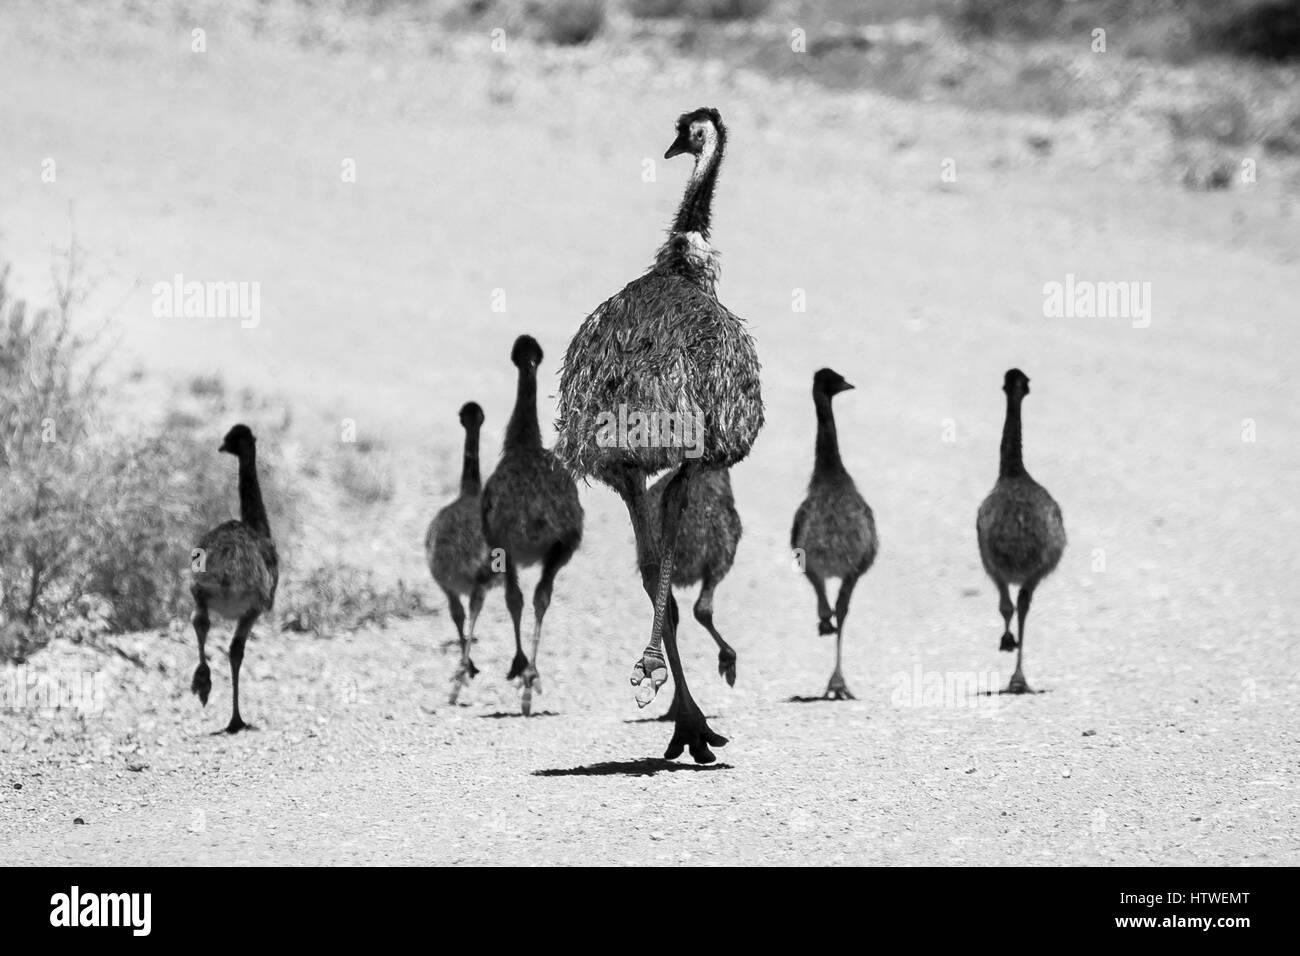 Emu - Australia - Stock Image